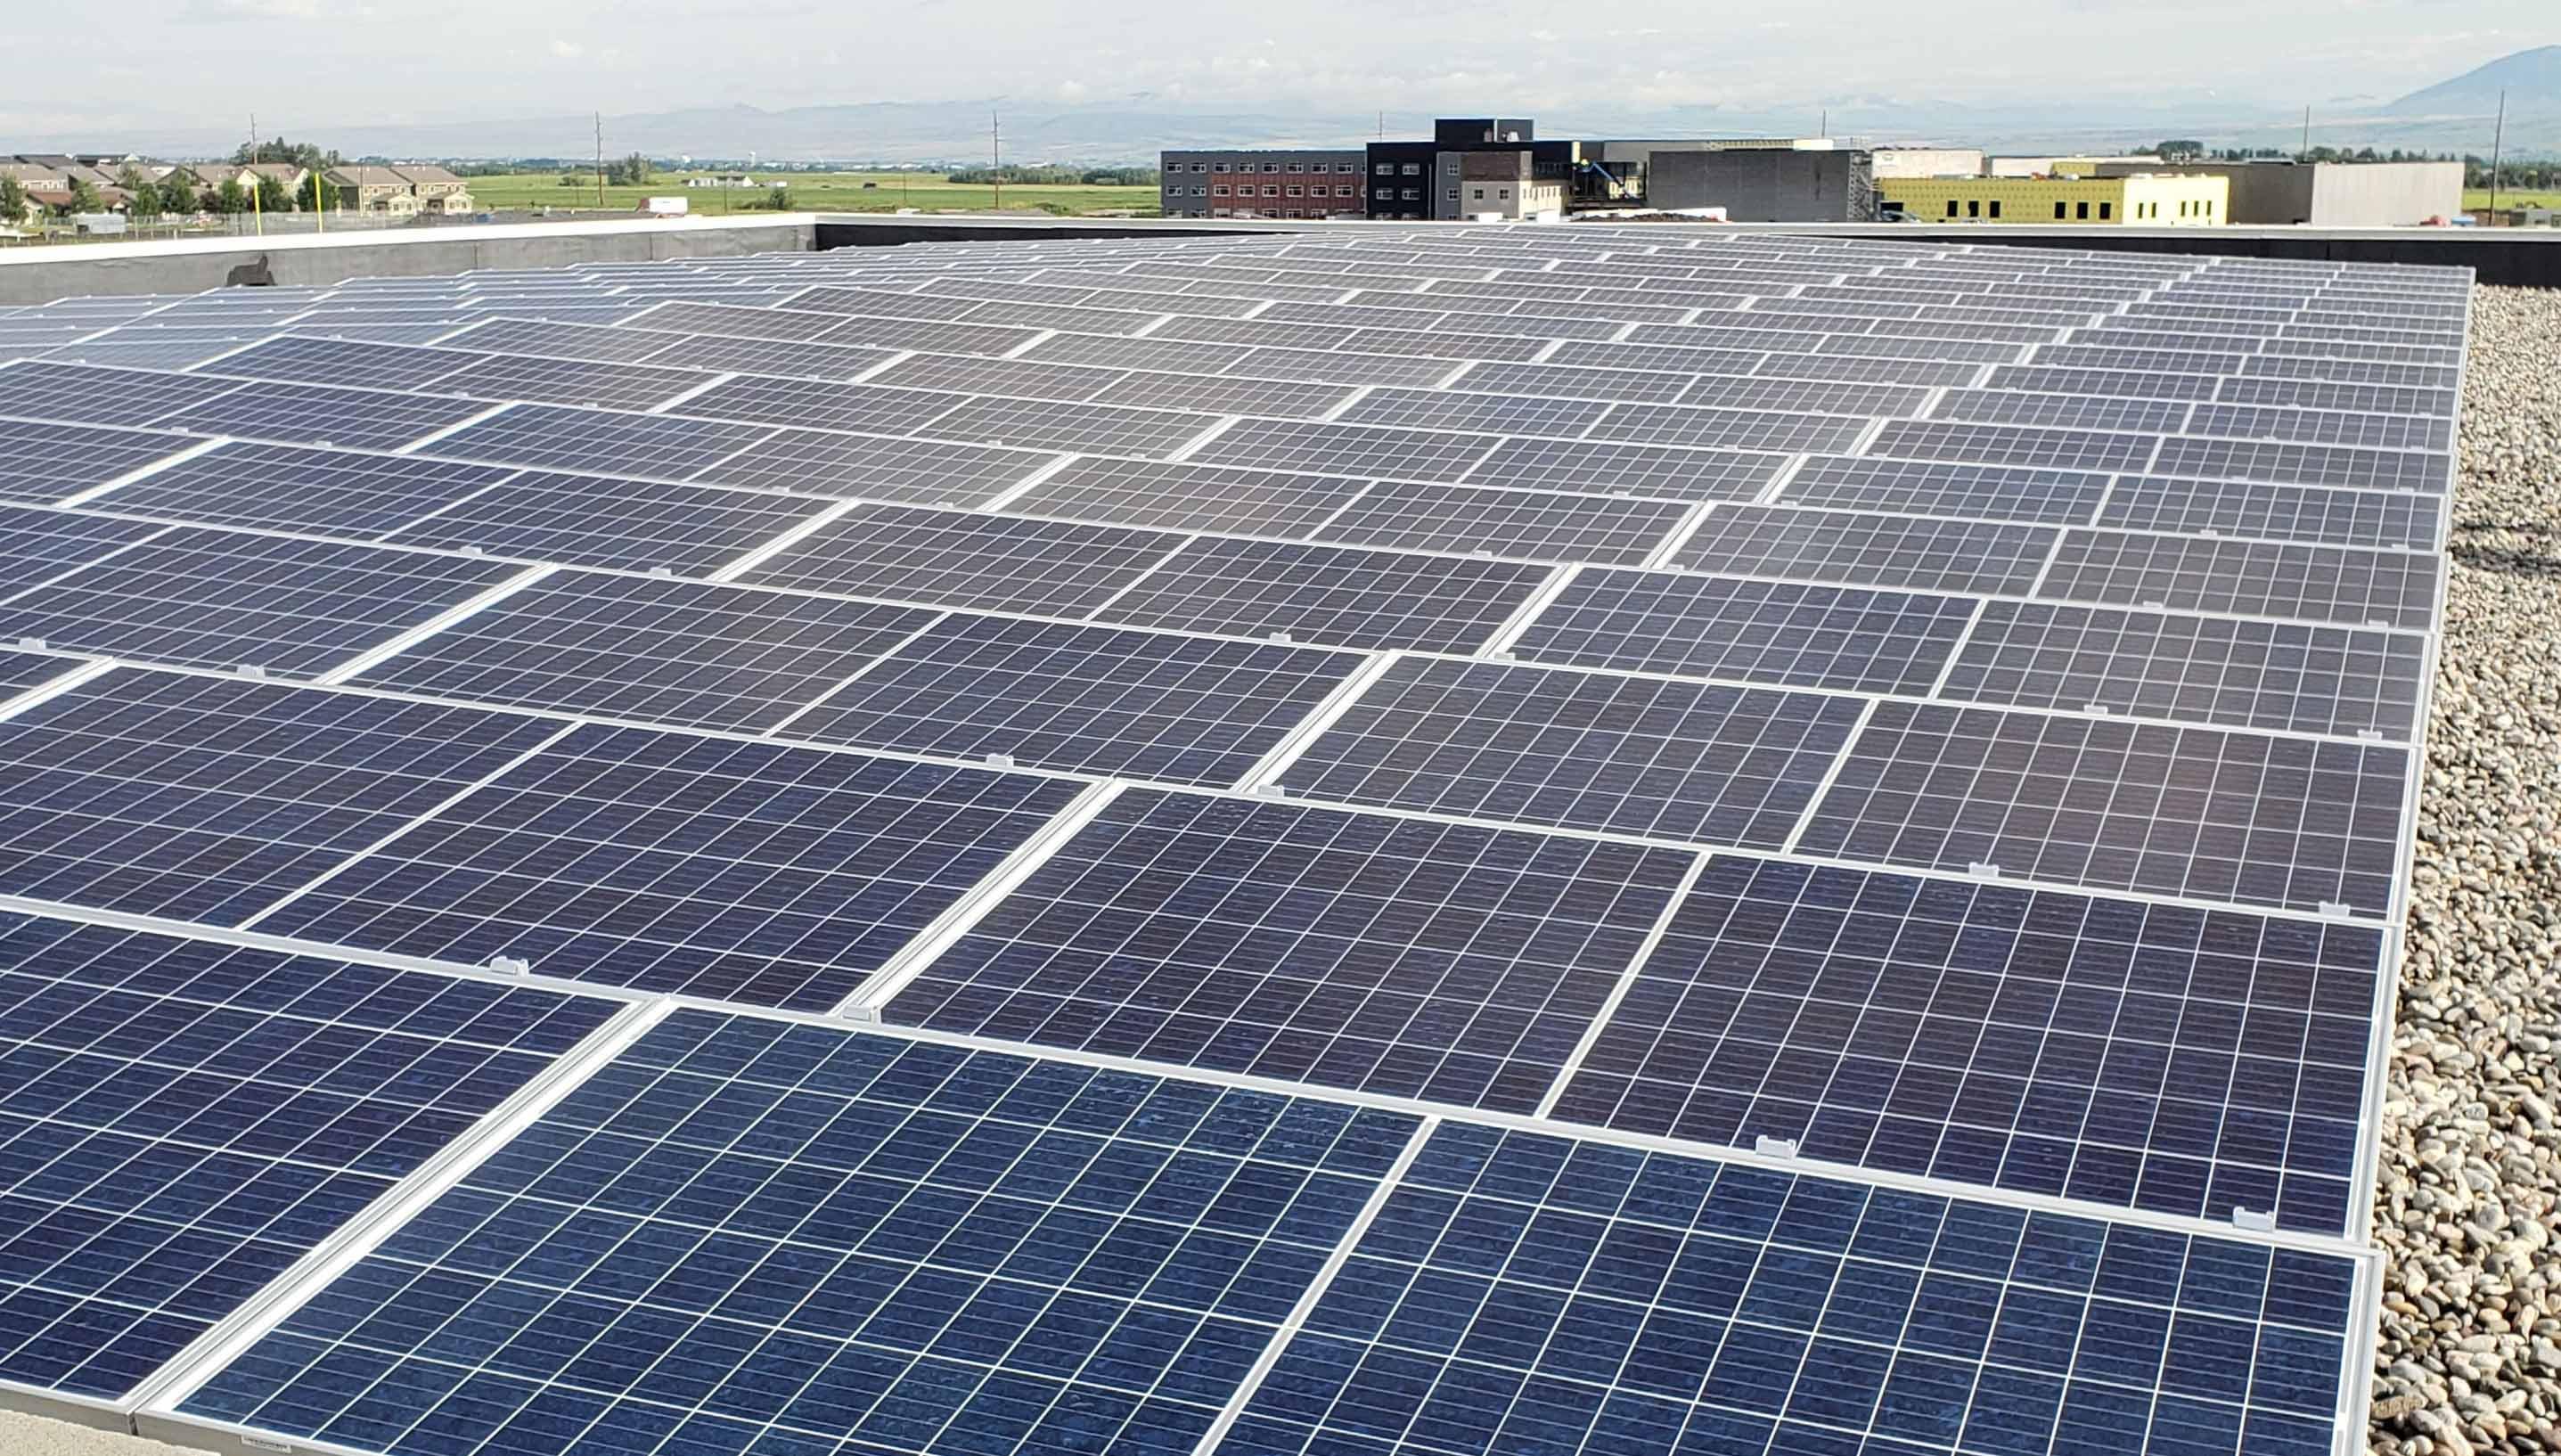 Bozeman Schools Solar Panels Ae Dynamics